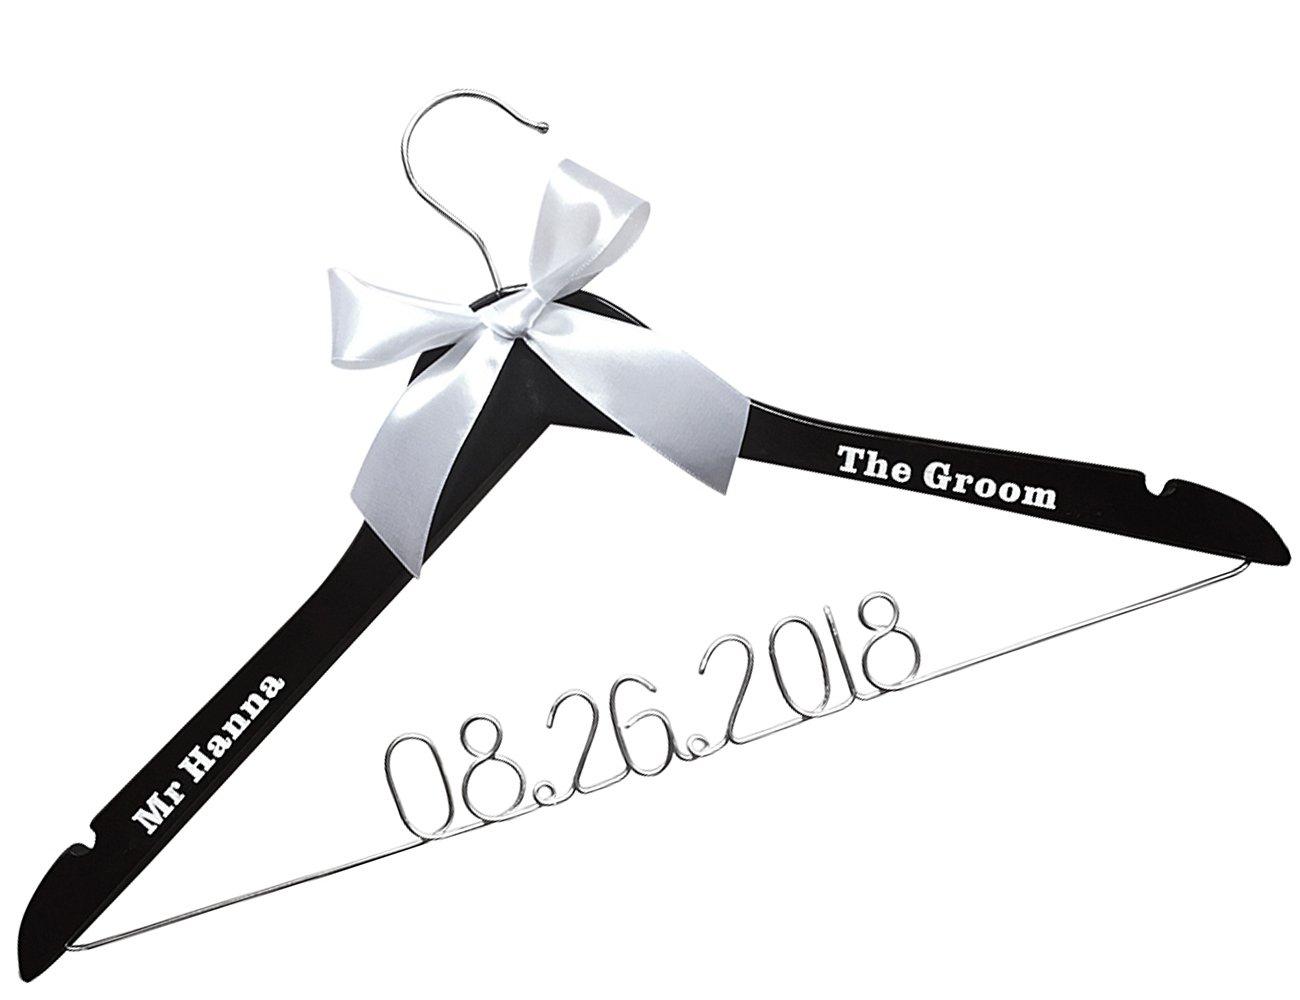 Custom Groom Personalized Bride Wedding Hangers-Custom Personalized Bridal Dress Hanger Gifts for Bride Mother of the Bride's Gifts gifts for groom etnecklace